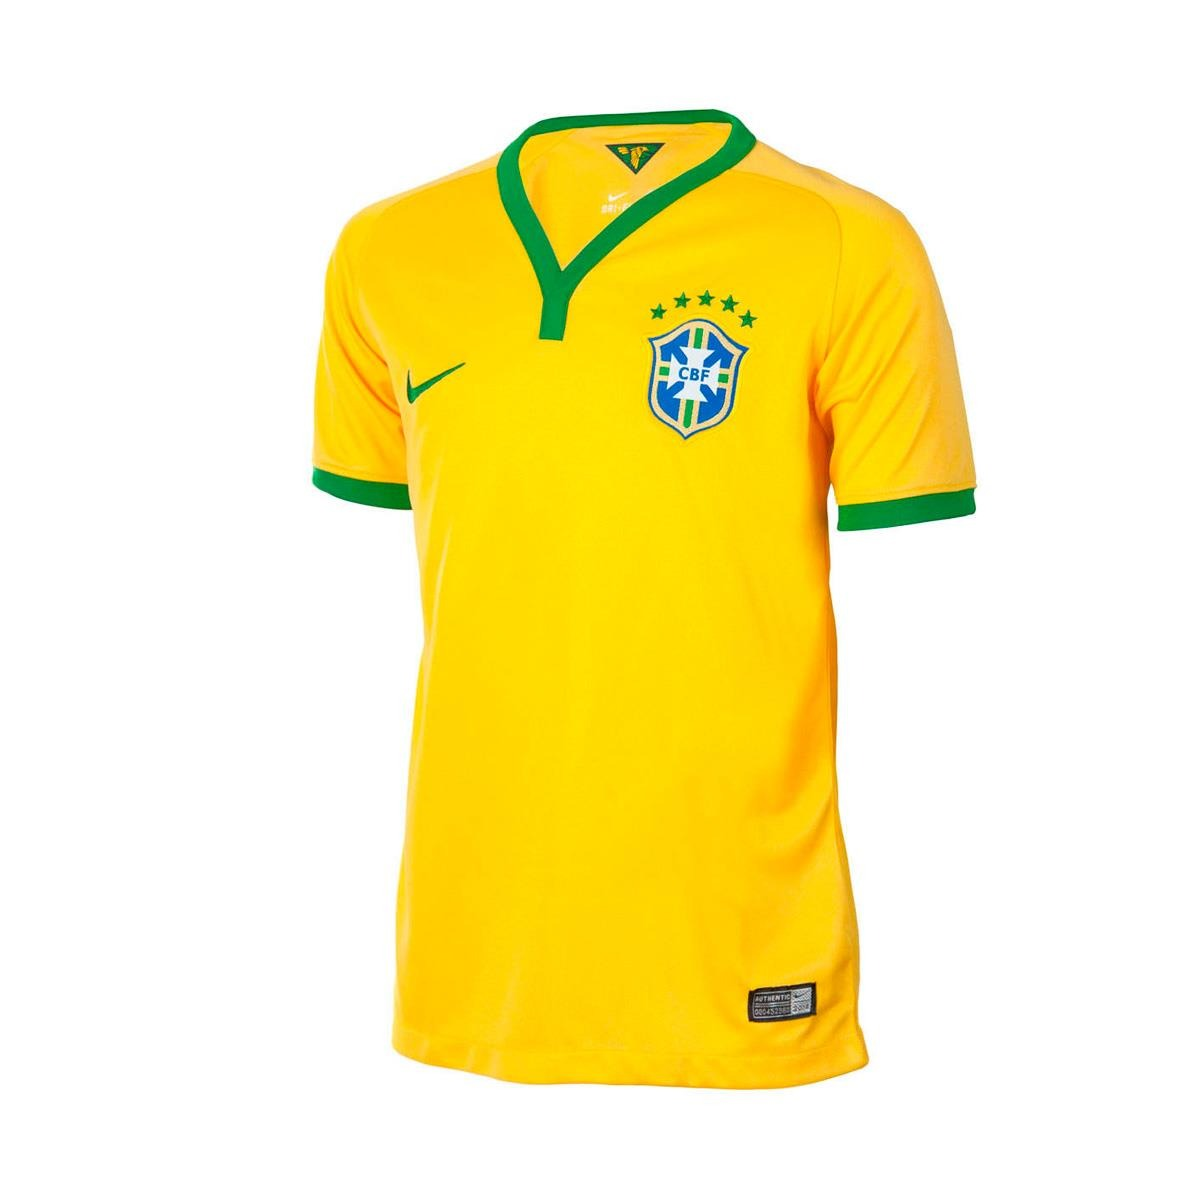 20bf56f1492 camisa oficial nike brasil cbf 2014 torcedor gg. Carregando zoom.